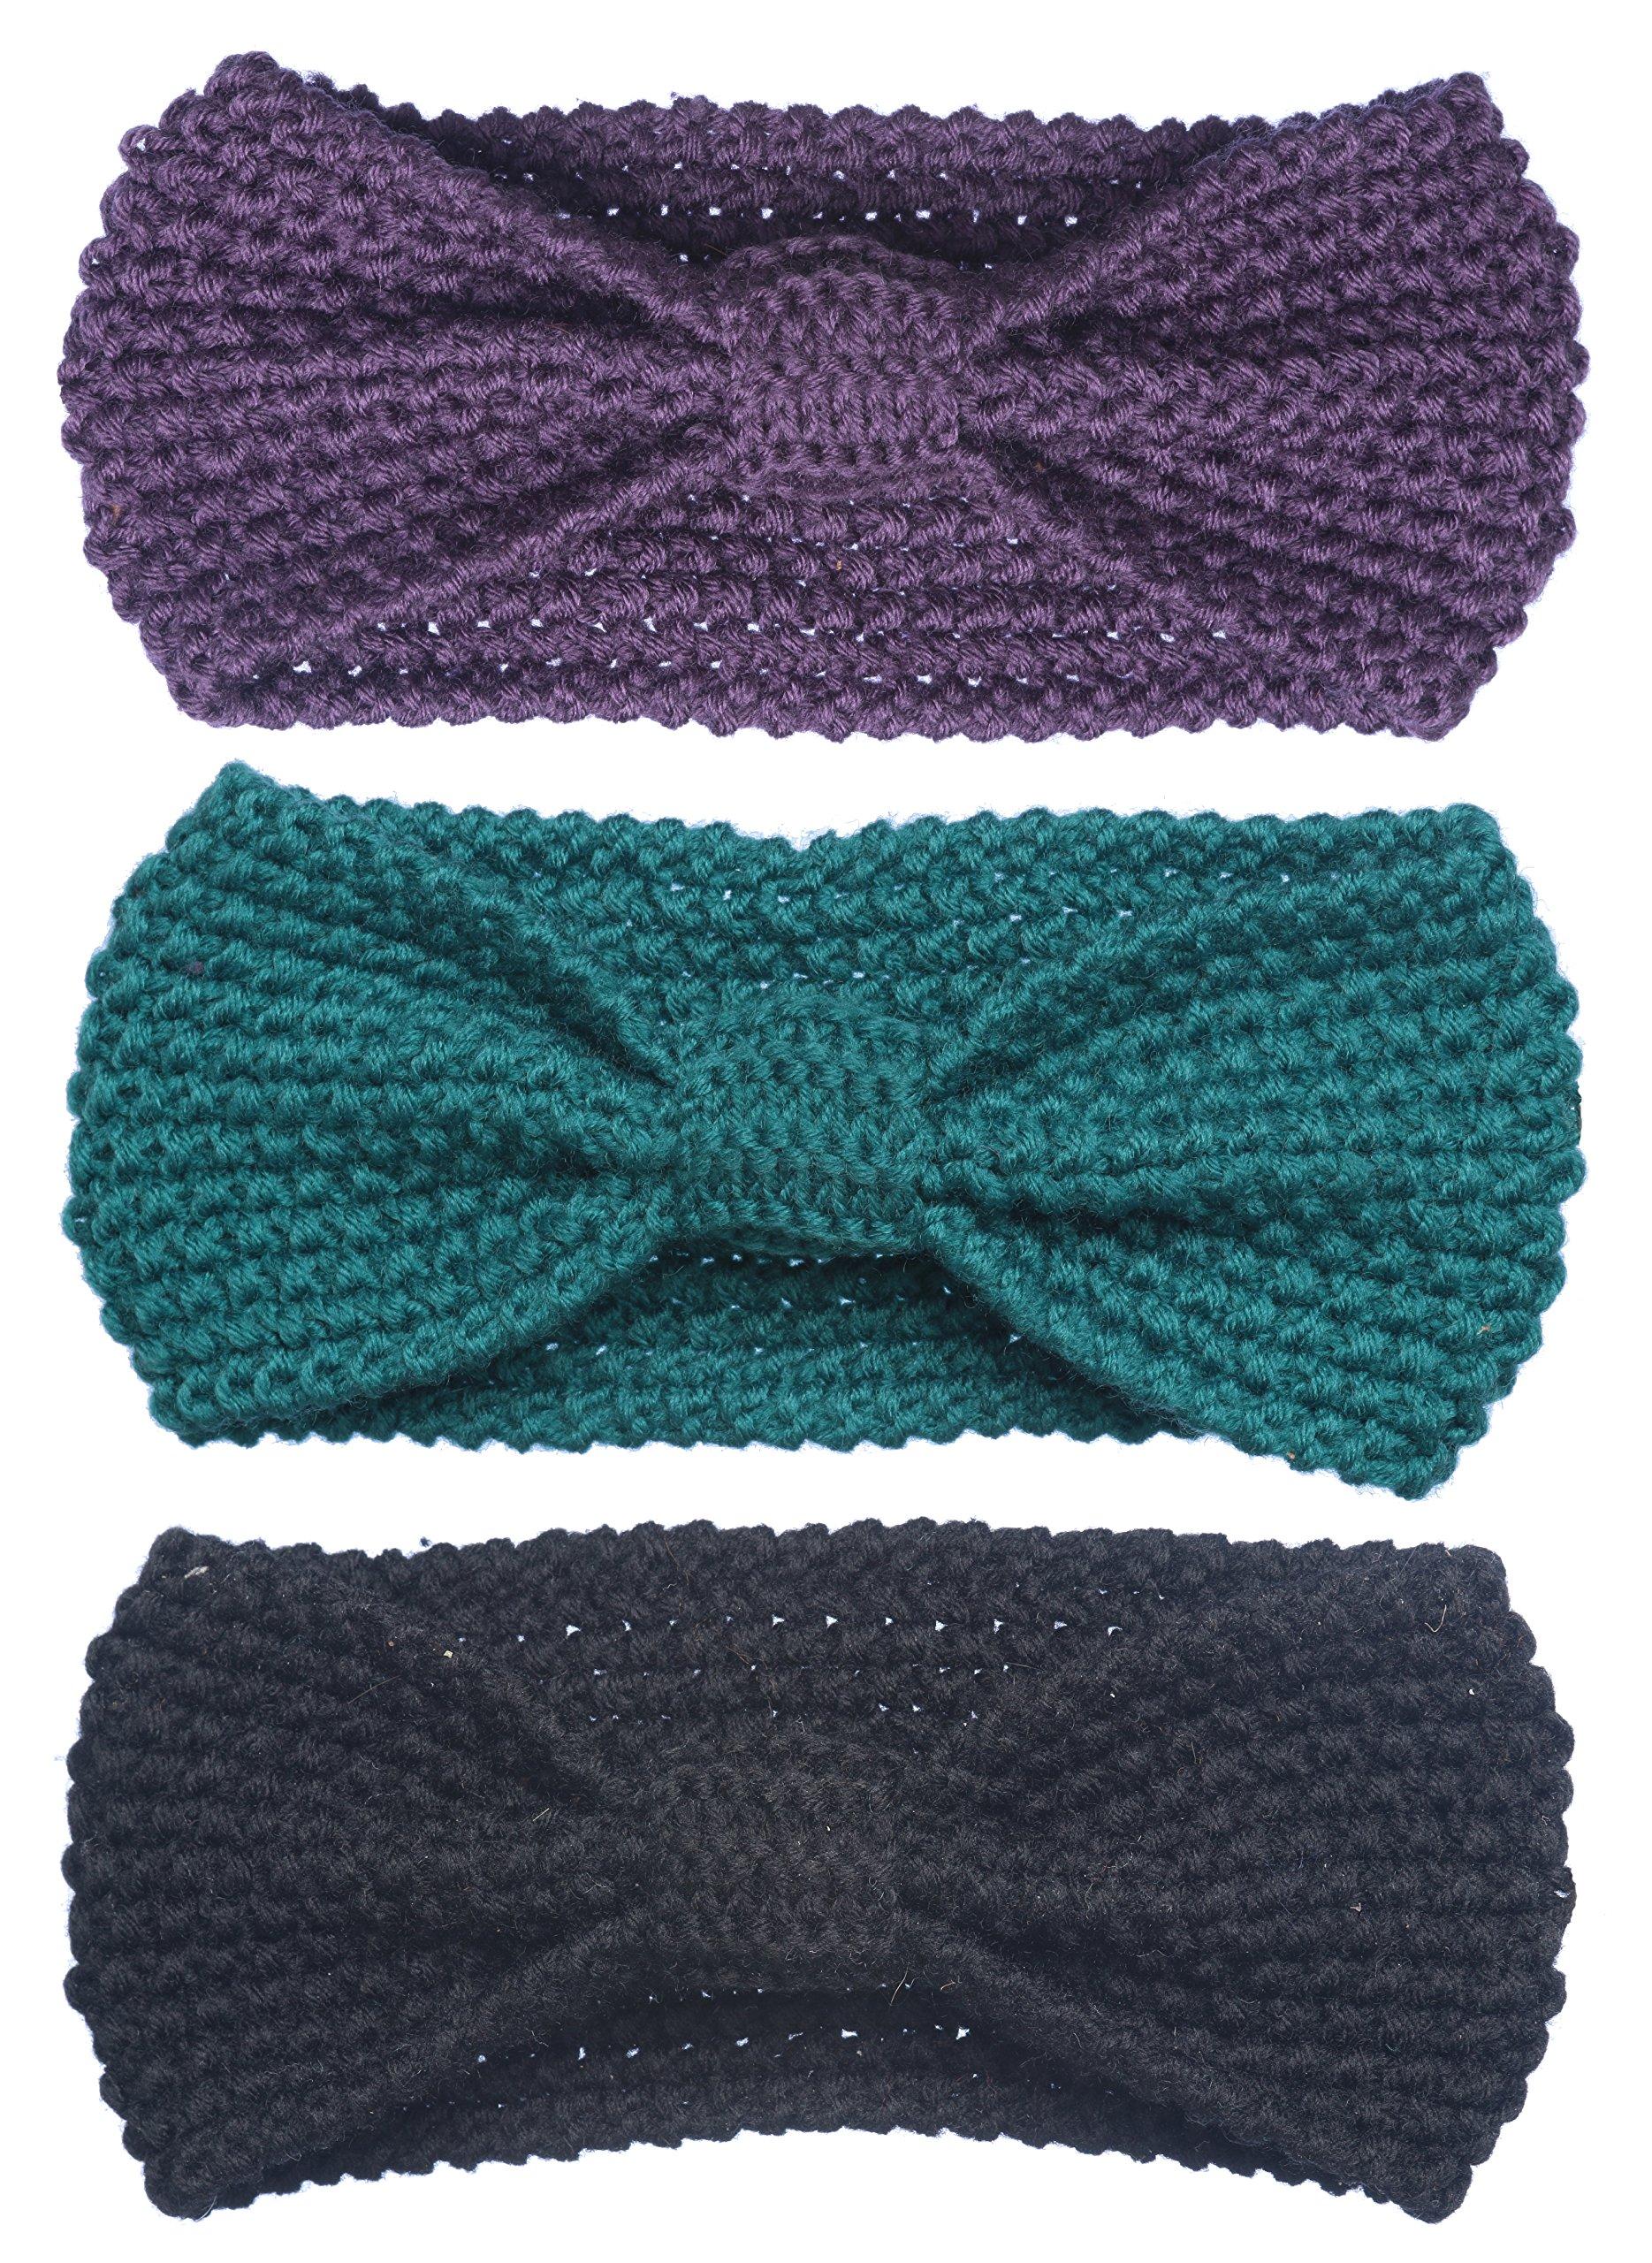 Bertelli 3 Pack Womens Winter Knit Headband & Hairband Ear Warmer (Blue-Violet-Black)